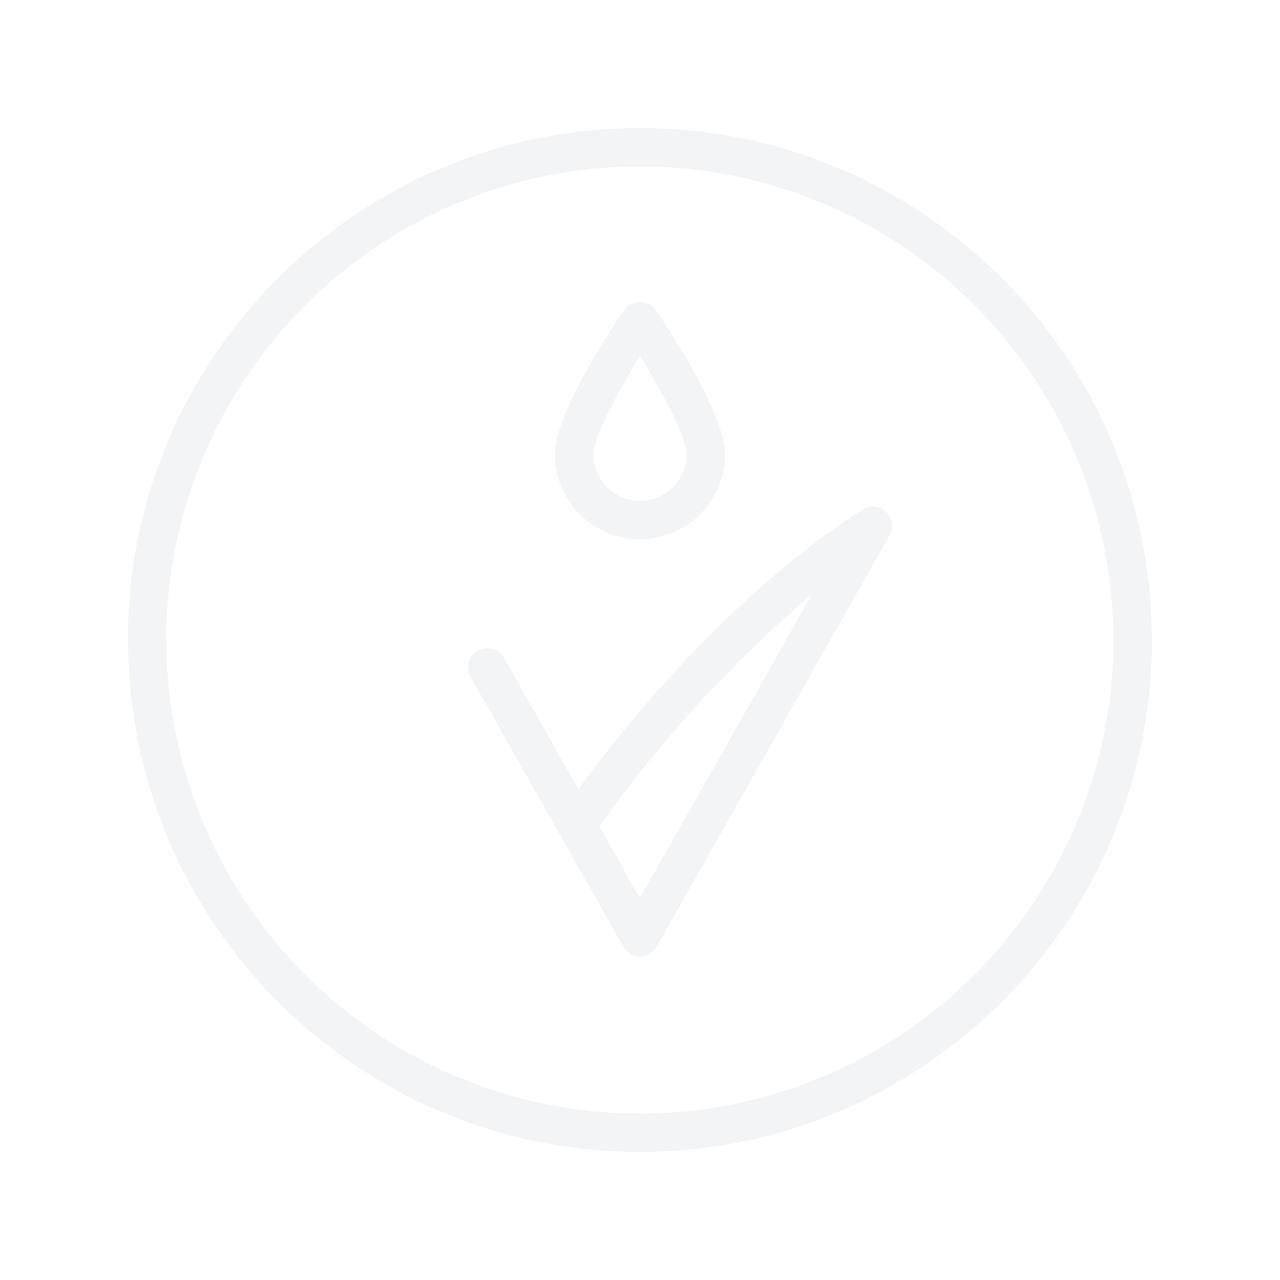 REAL TECHNIQUES Lip Brush + Blur Brush